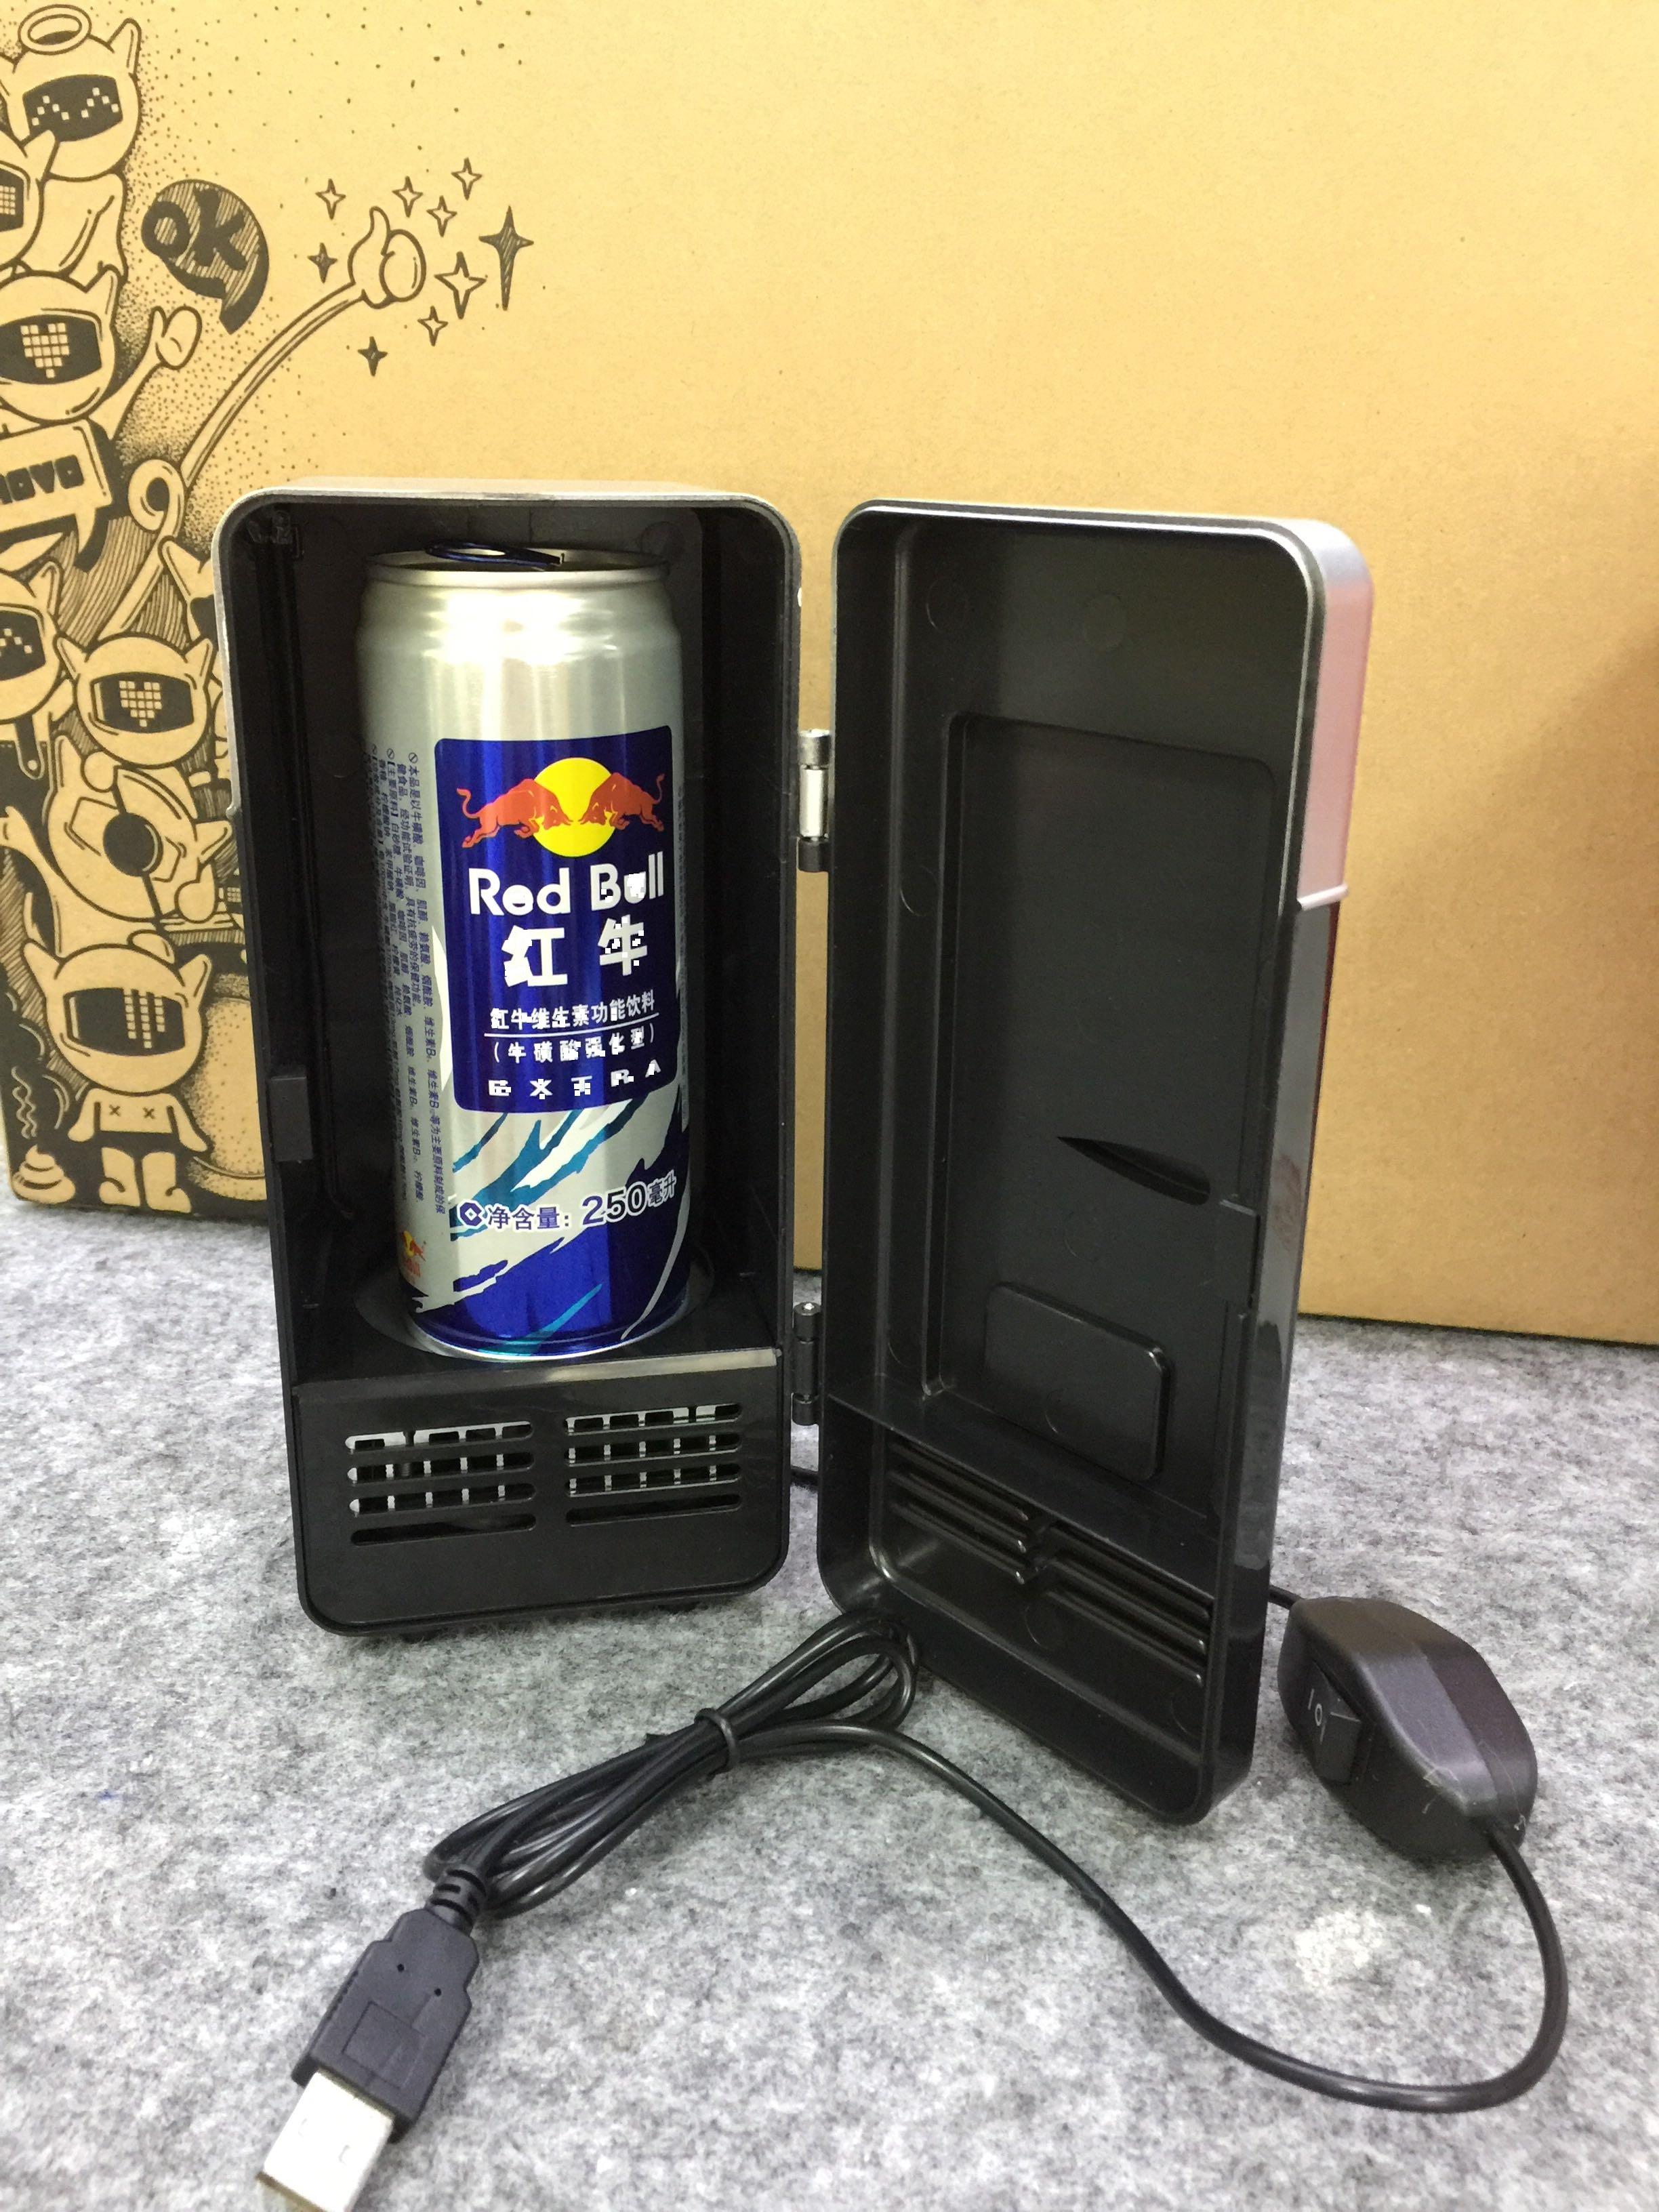 USB快速制冷冰箱/冷暖两用迷你冰箱/微型小型冰箱/小家电 厂家